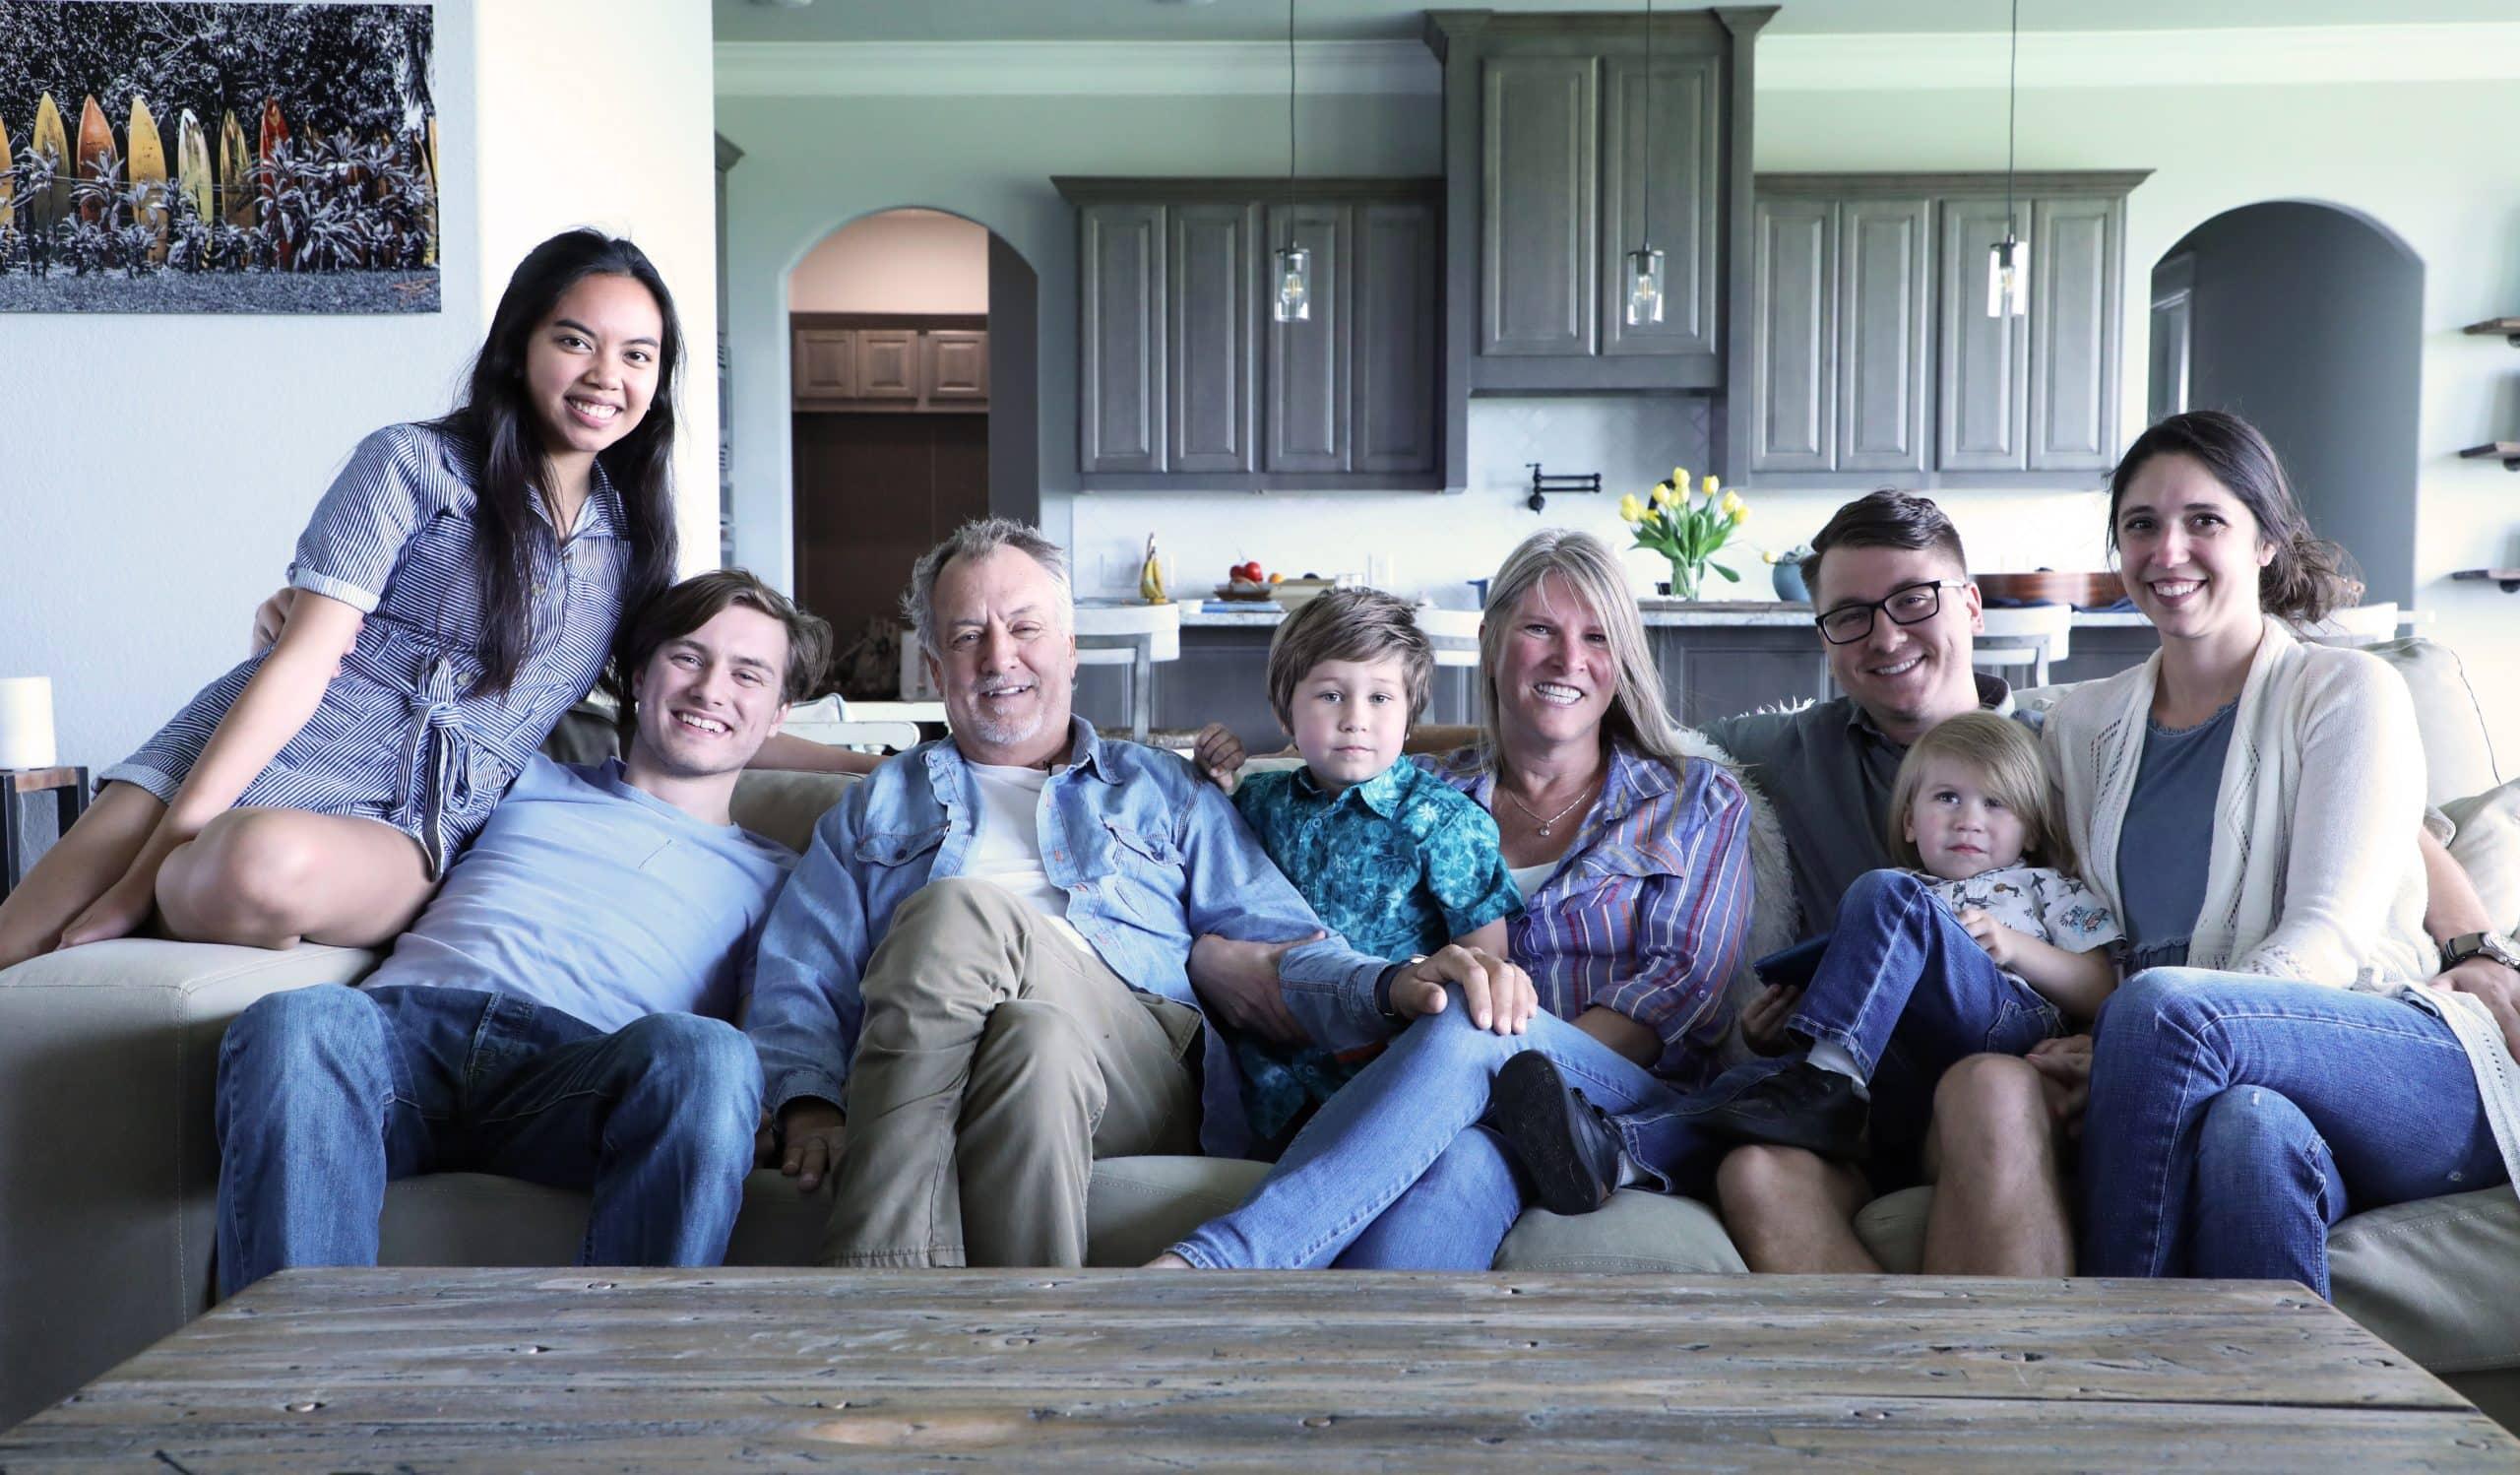 The Gates family (from left): Isabel Arcellana, Devon Gates, Dennis Gates, James Gates, Jana Gates, Christian Gates, Noah Gates, and Gabrielle Gates